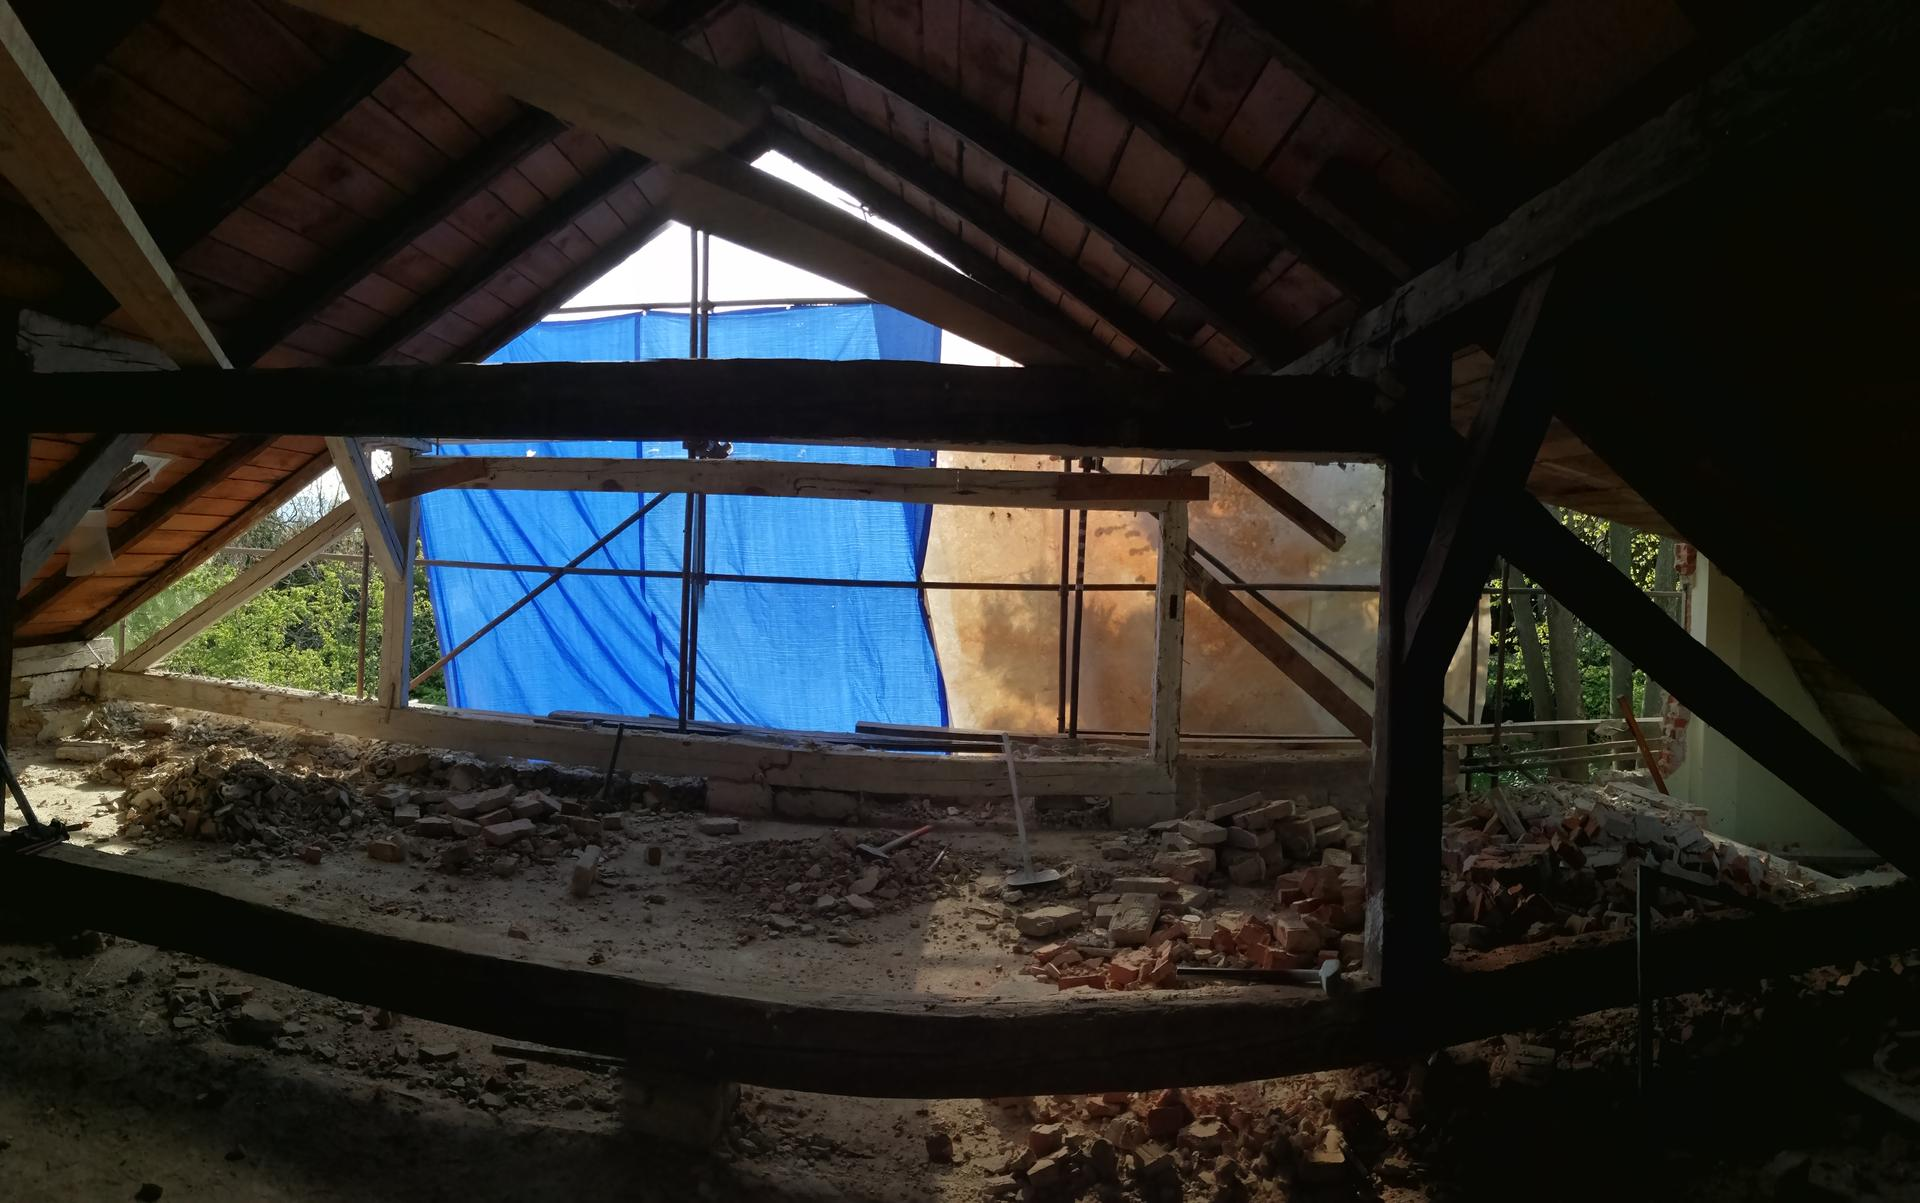 Prestavba podkrovia zo sedlovo valbovej na sedlovú strechu. - Obrázok č. 50